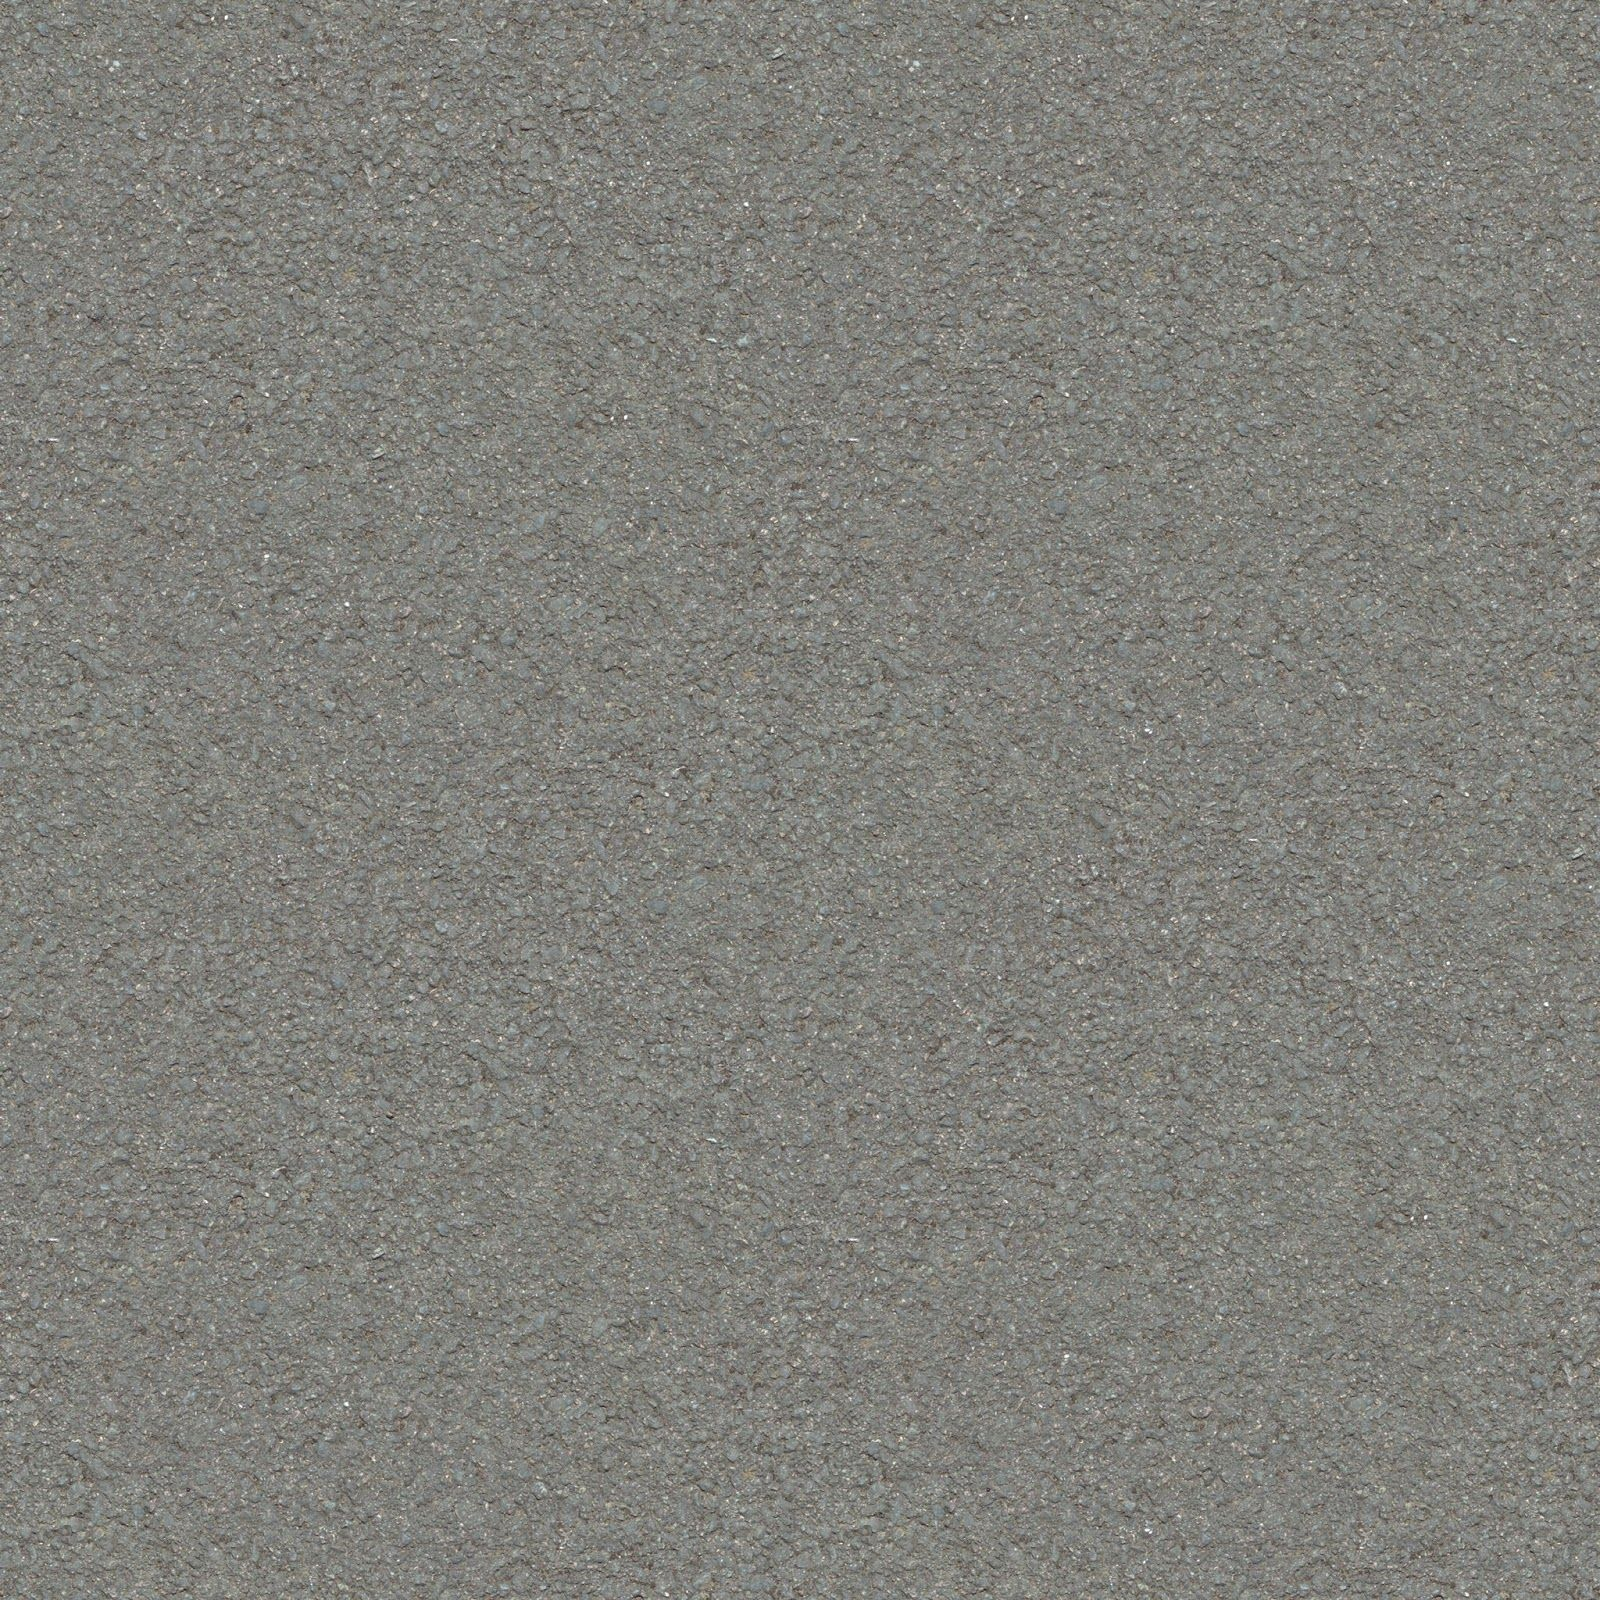 (ASPHALT+1)+seamless+tarmac+road+tar+texture.jpg (1600